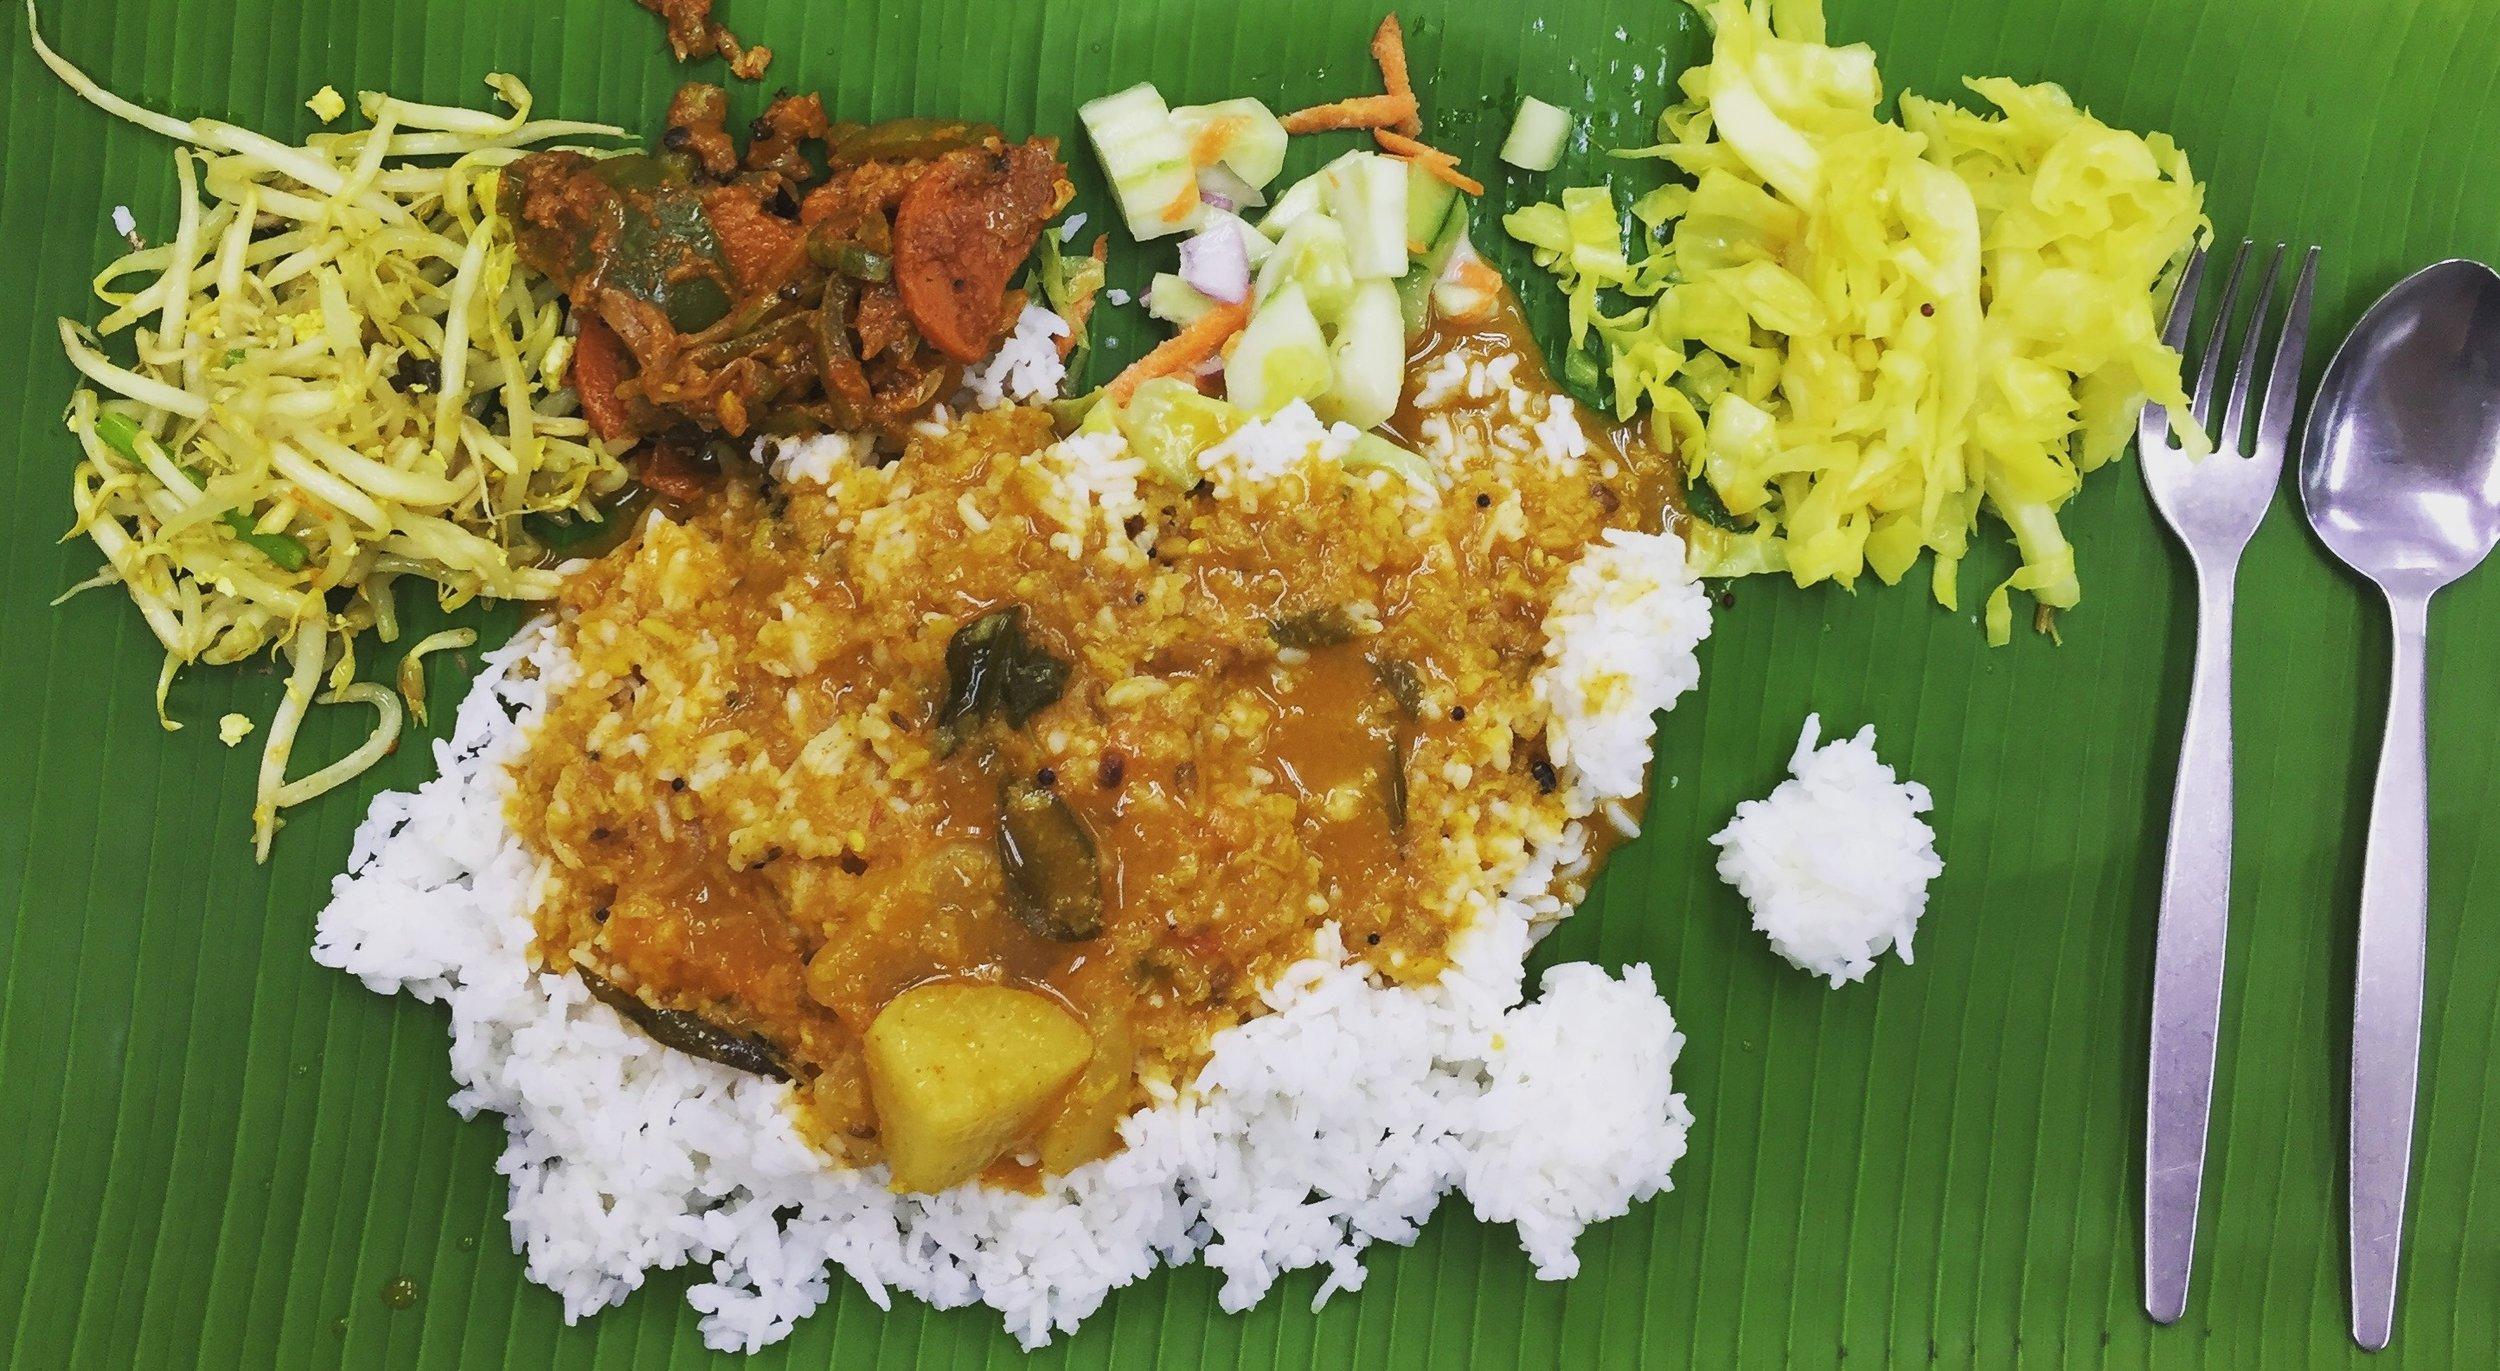 restoran-jaipur-curry-house-kl.png